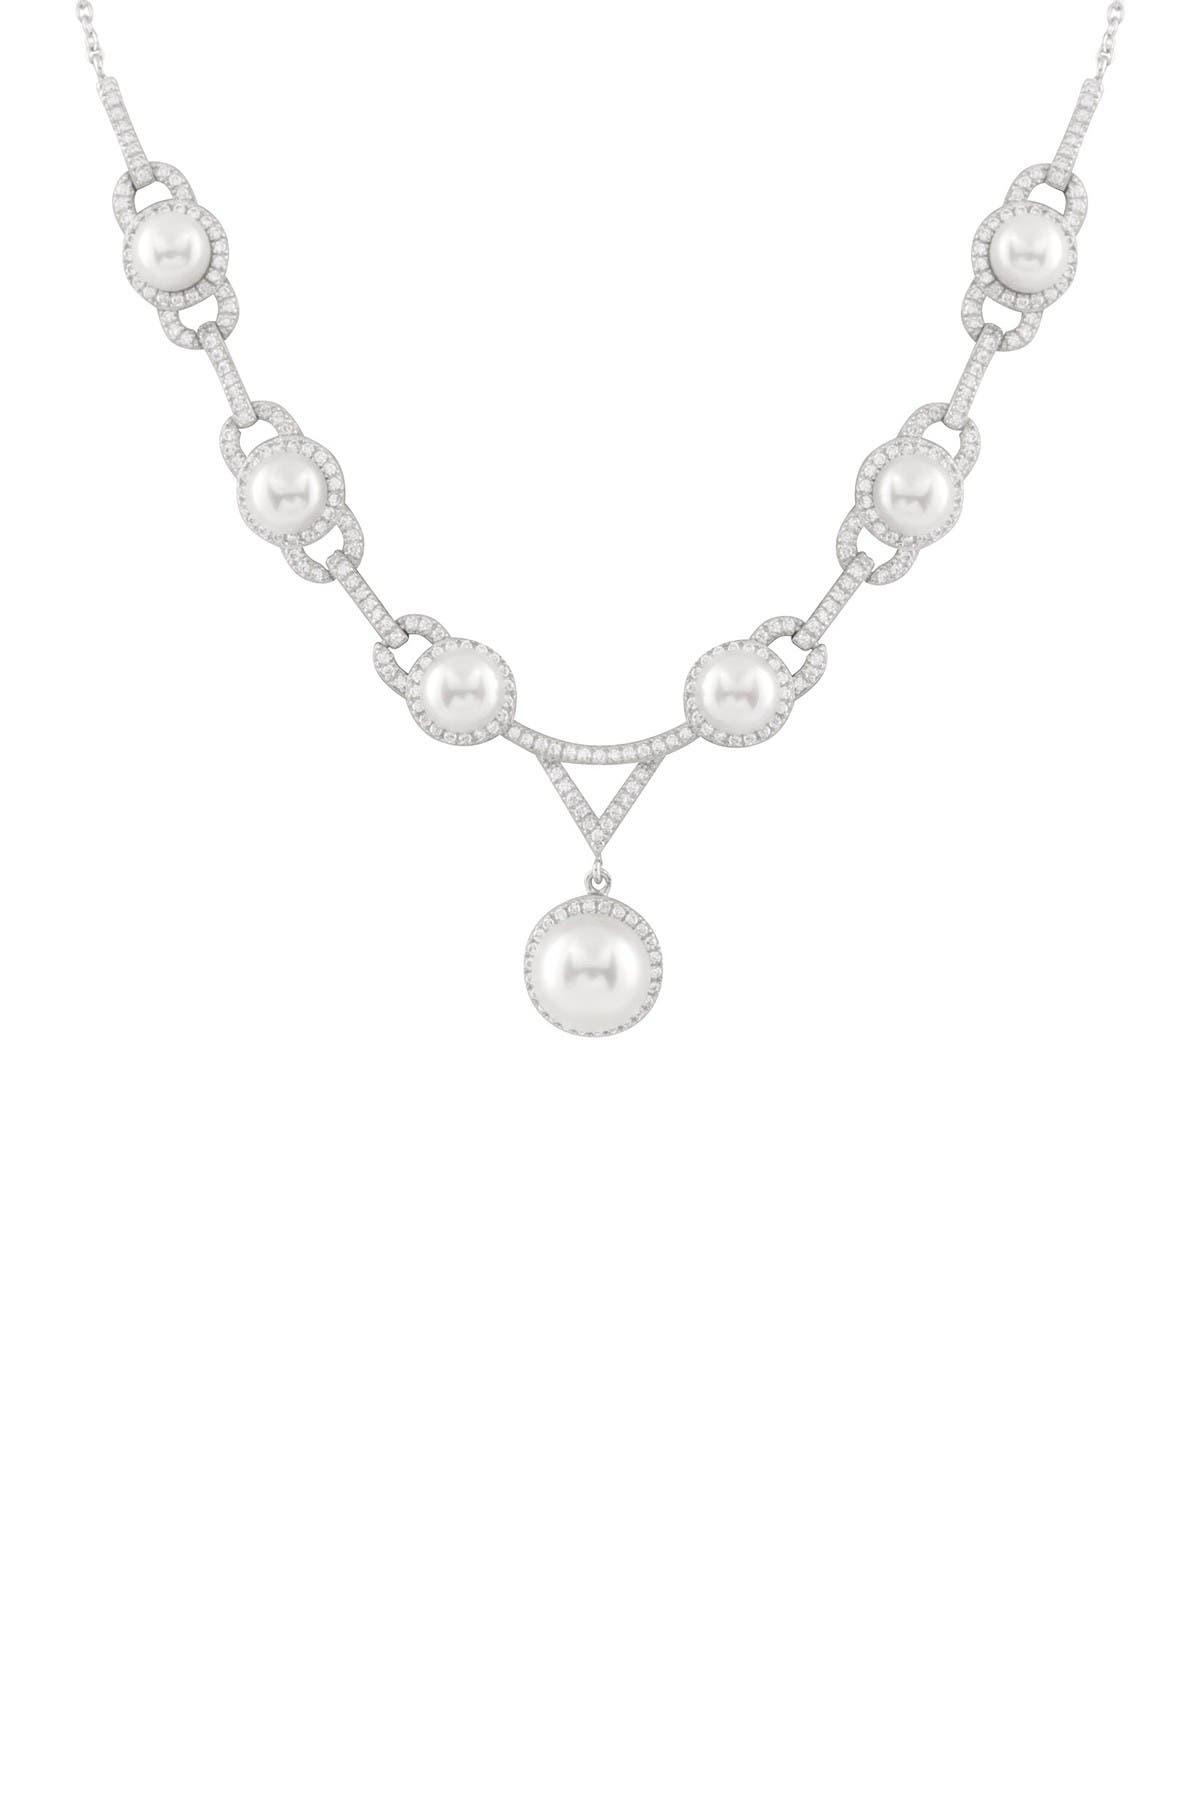 Image of Splendid Pearls Fancy 11-11.5mm Freshwater Pearl & CZ Bib Necklace